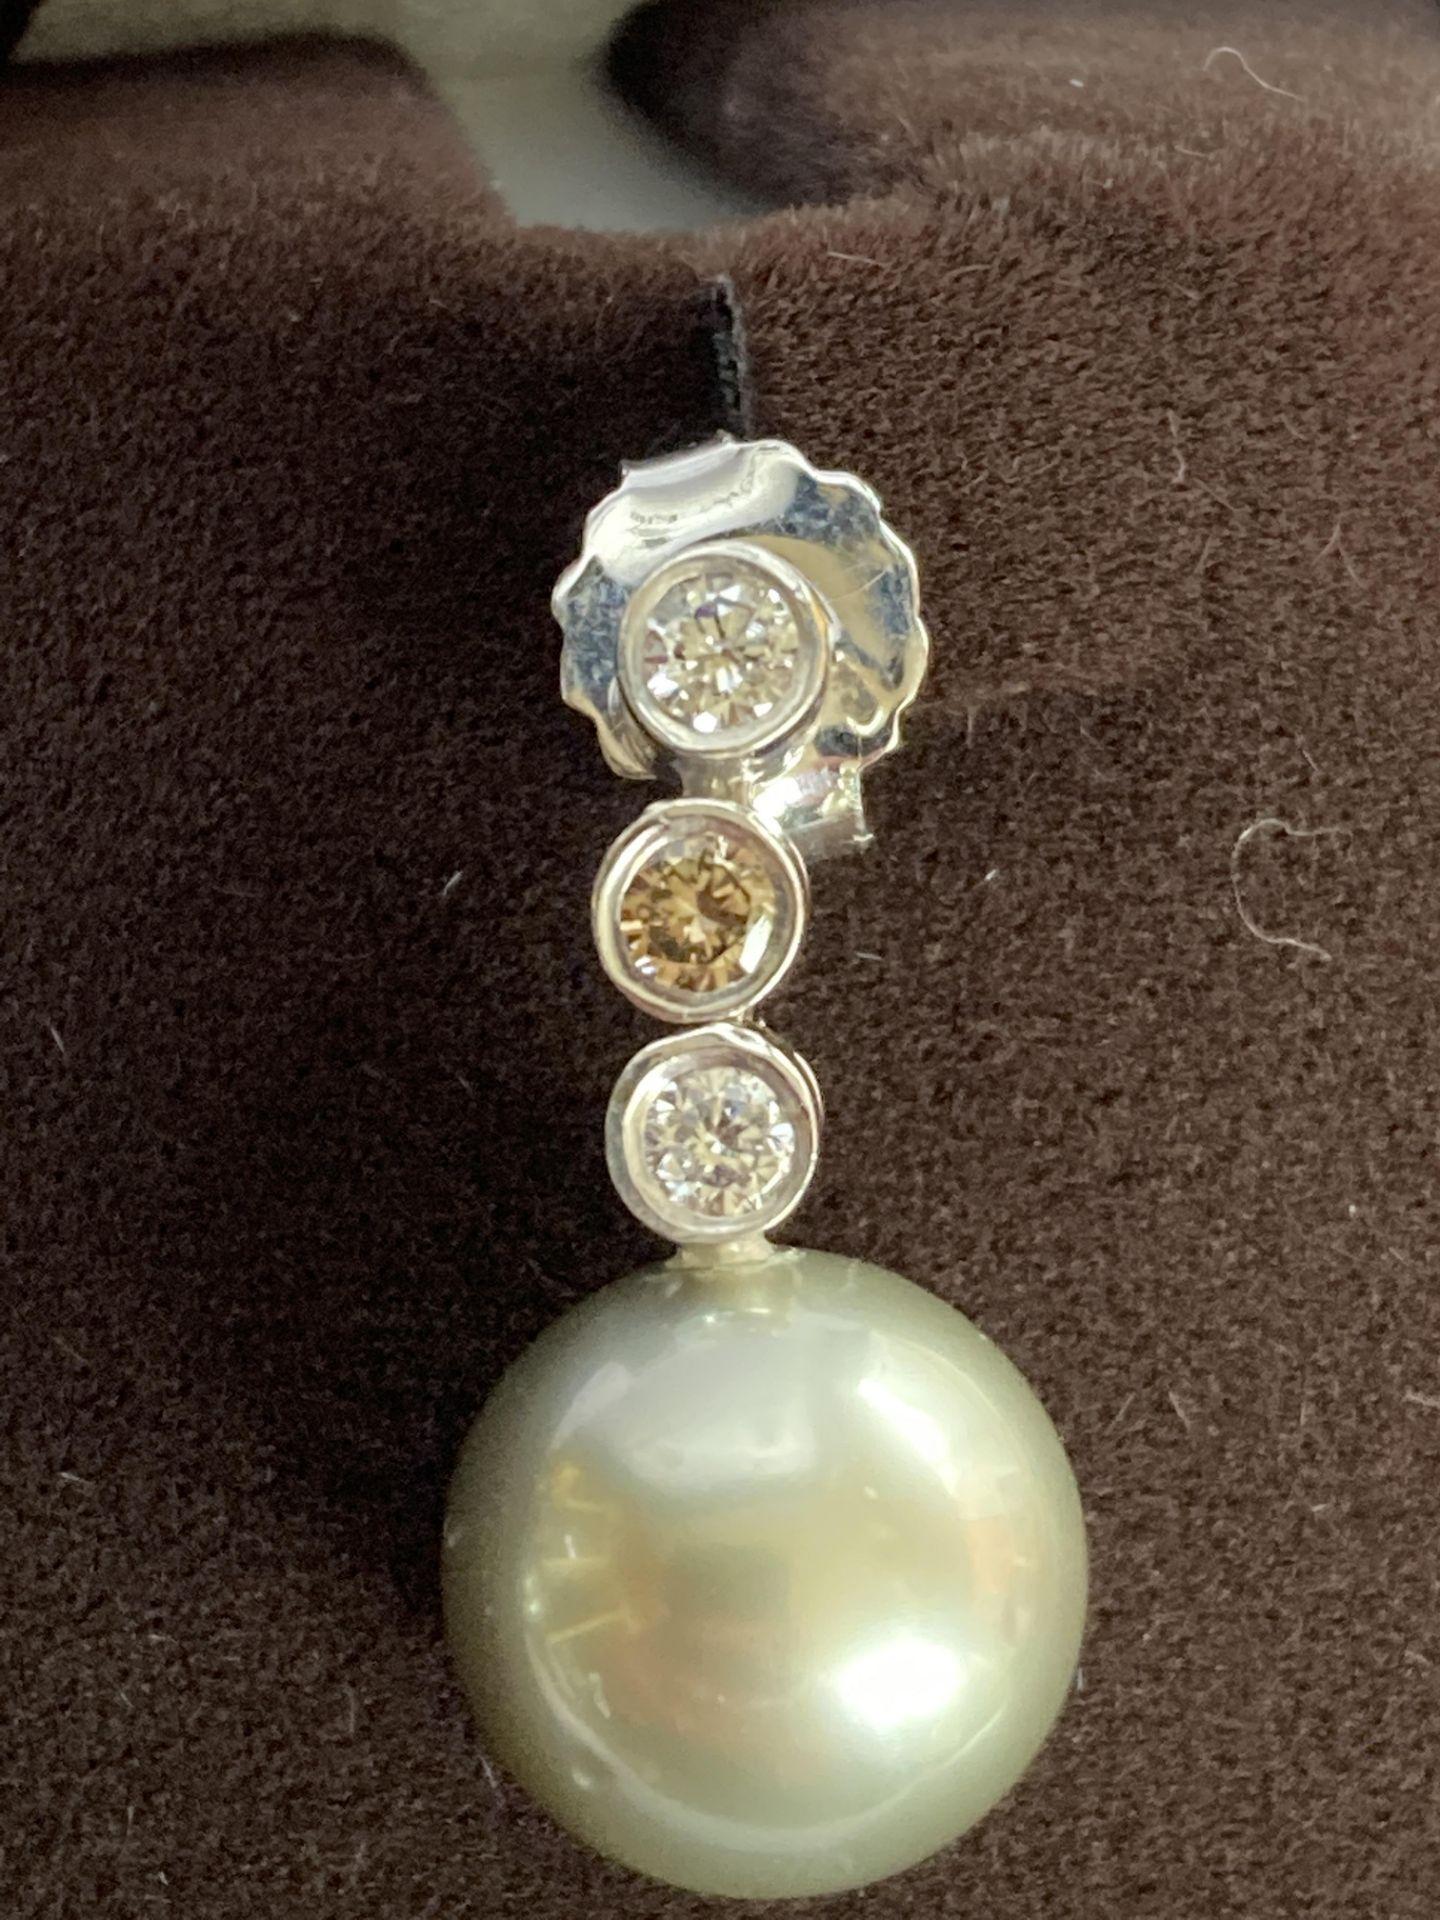 SOUTHSEA PEARL AND DIAMOND 18K EARRINGS - 0.3CT - Image 2 of 3